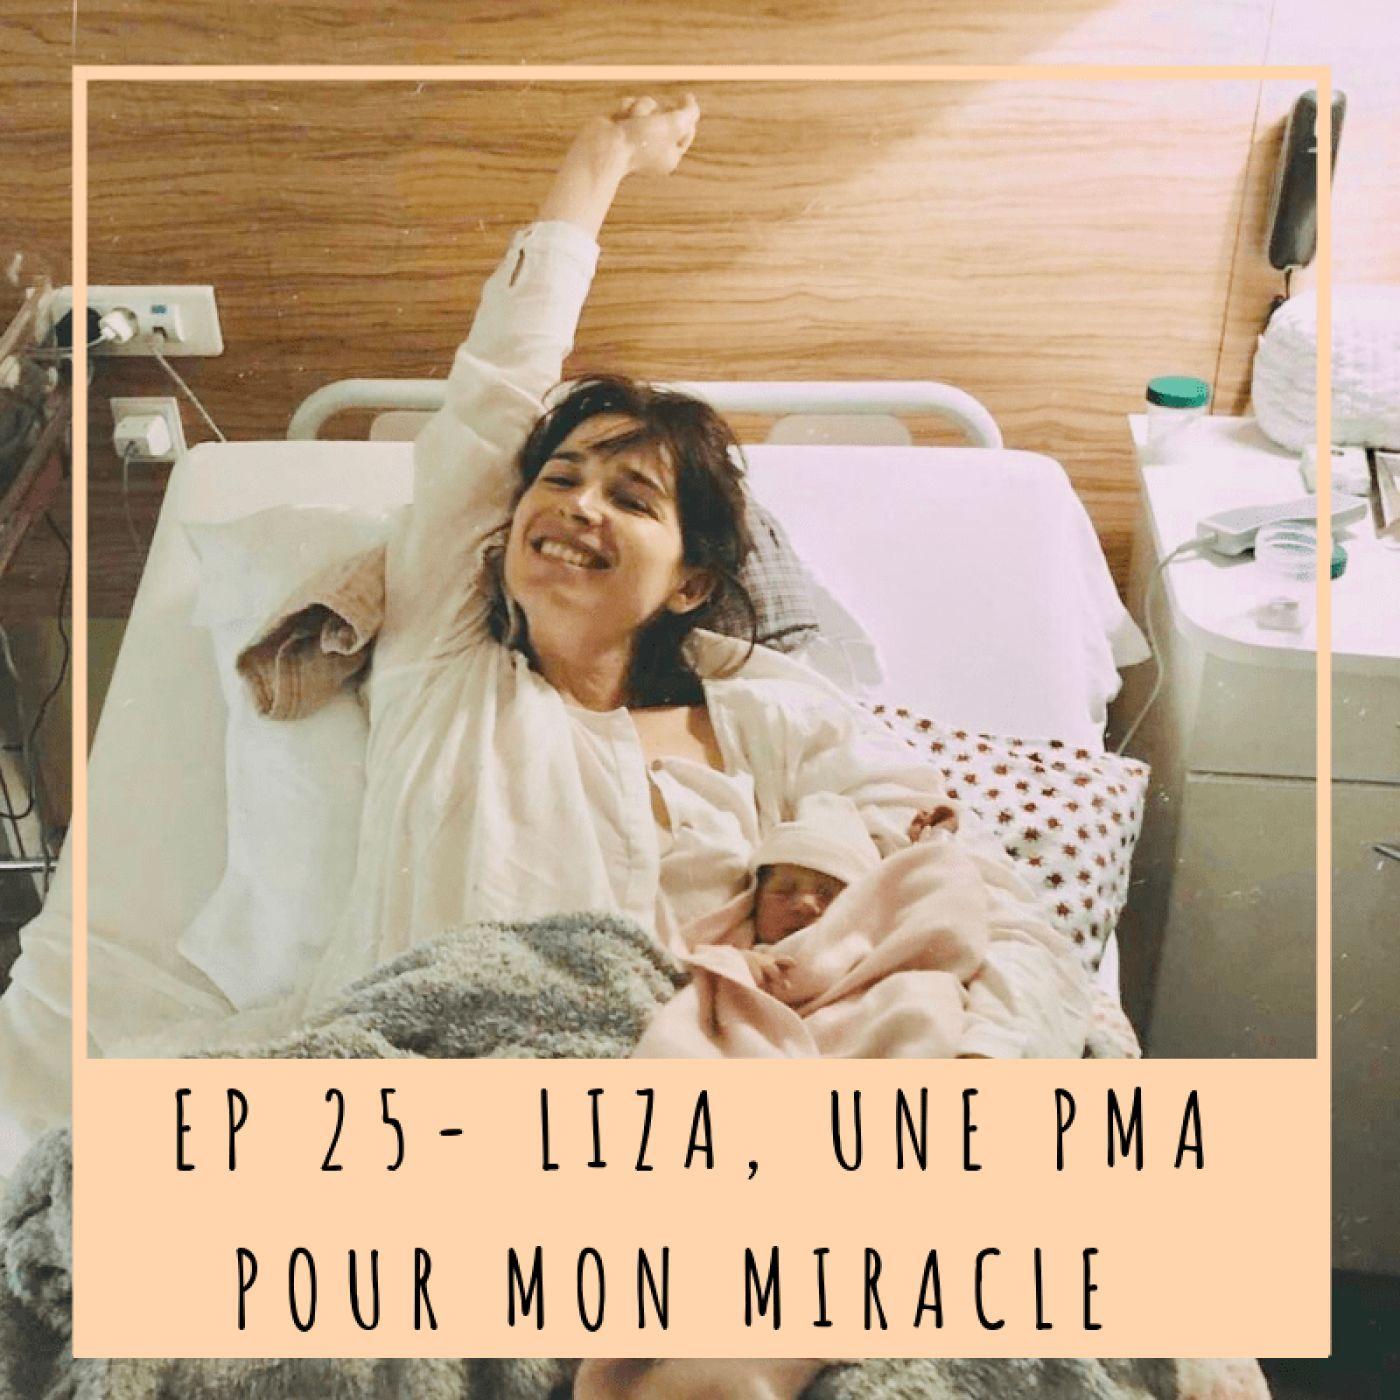 EP 25- LIZA, UNE PMA POUR MON MIRACLE